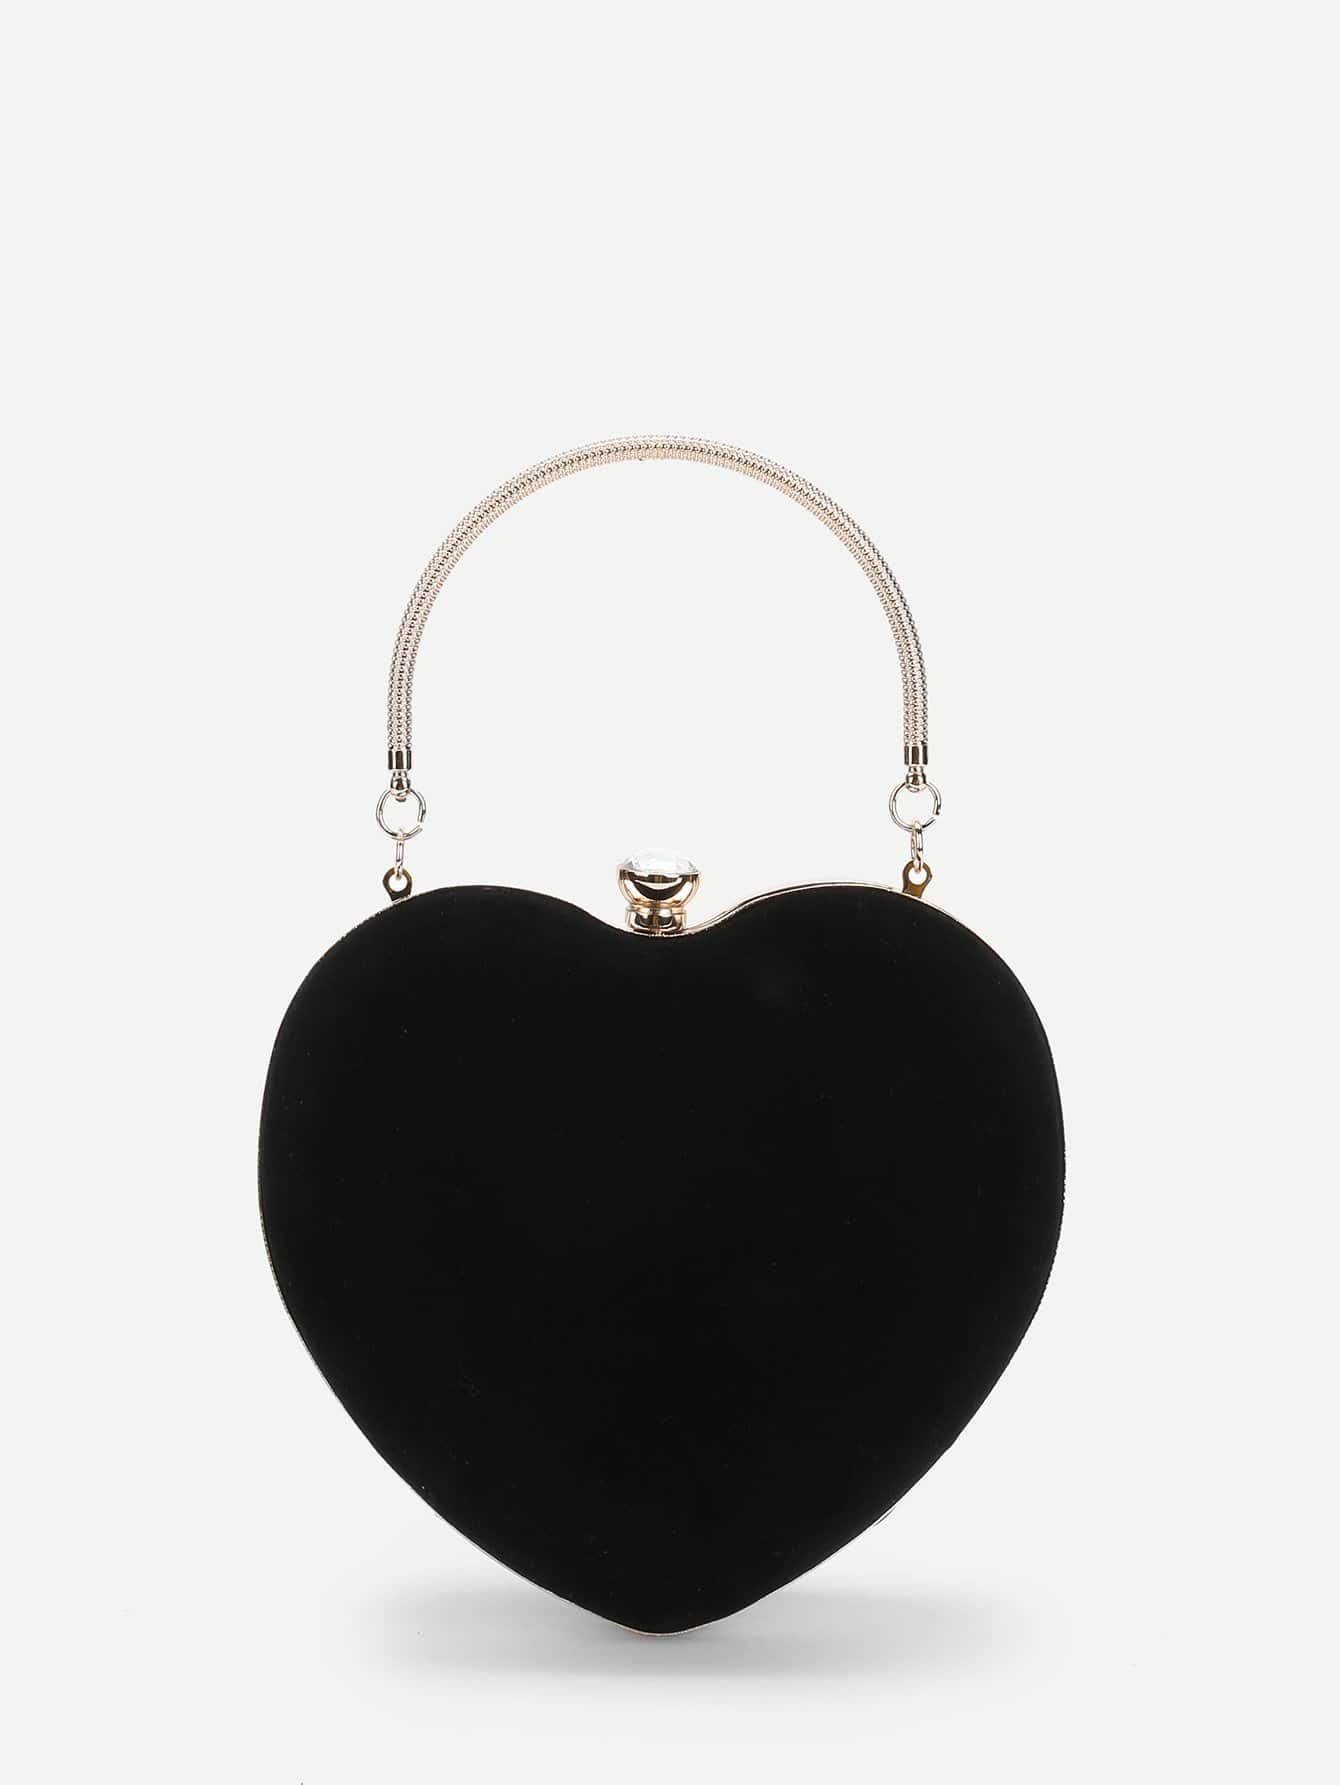 Heart-shaped Wallet With Ring Handle шины pirelli p zero direzionale 245 45 r18 96y